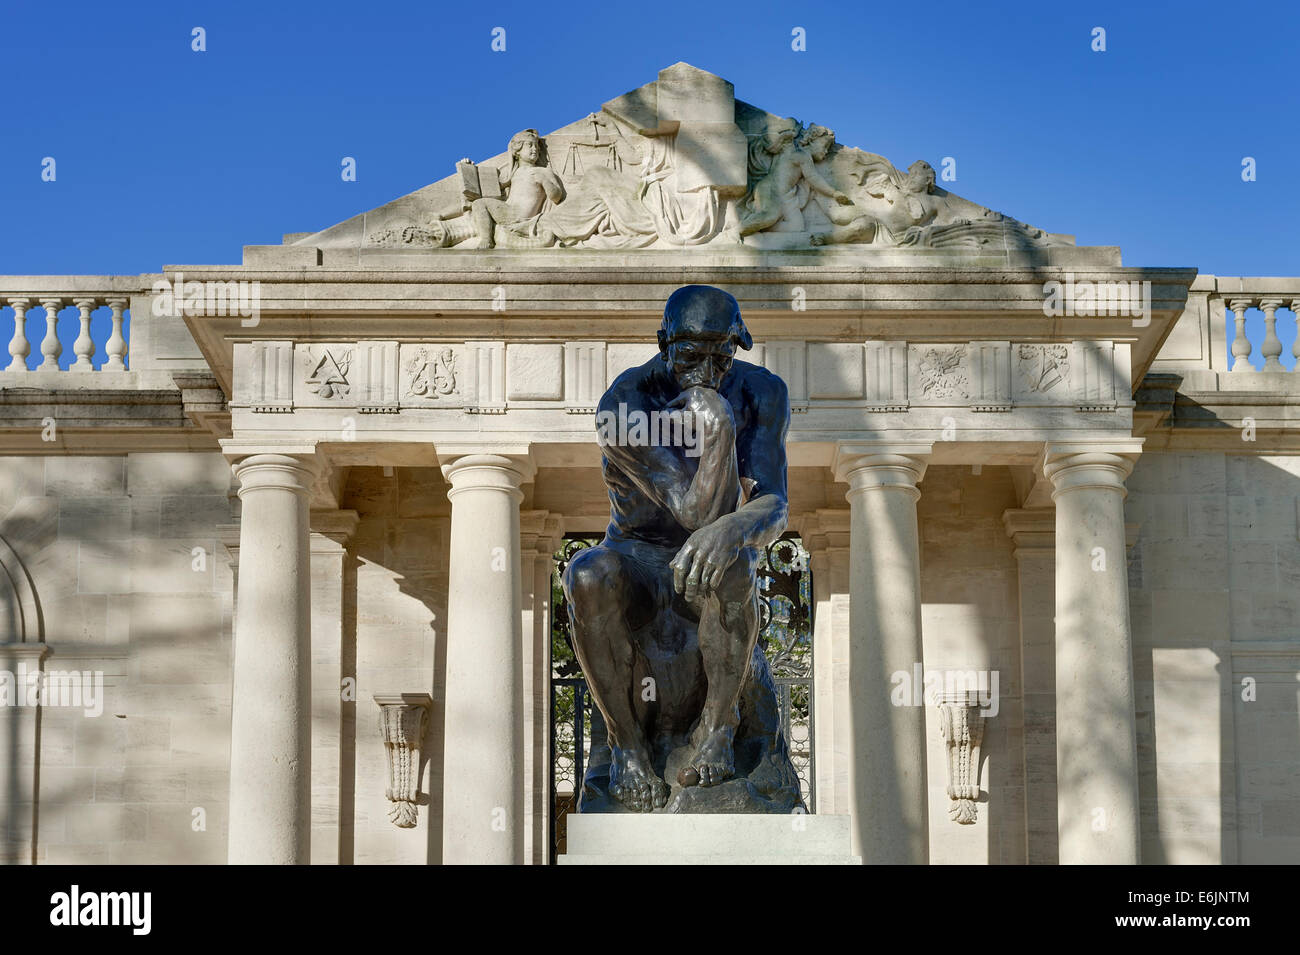 The Thinker sculpture at The Rodin Museum, Philadelphia, Pennsylvania, USA - Stock Image